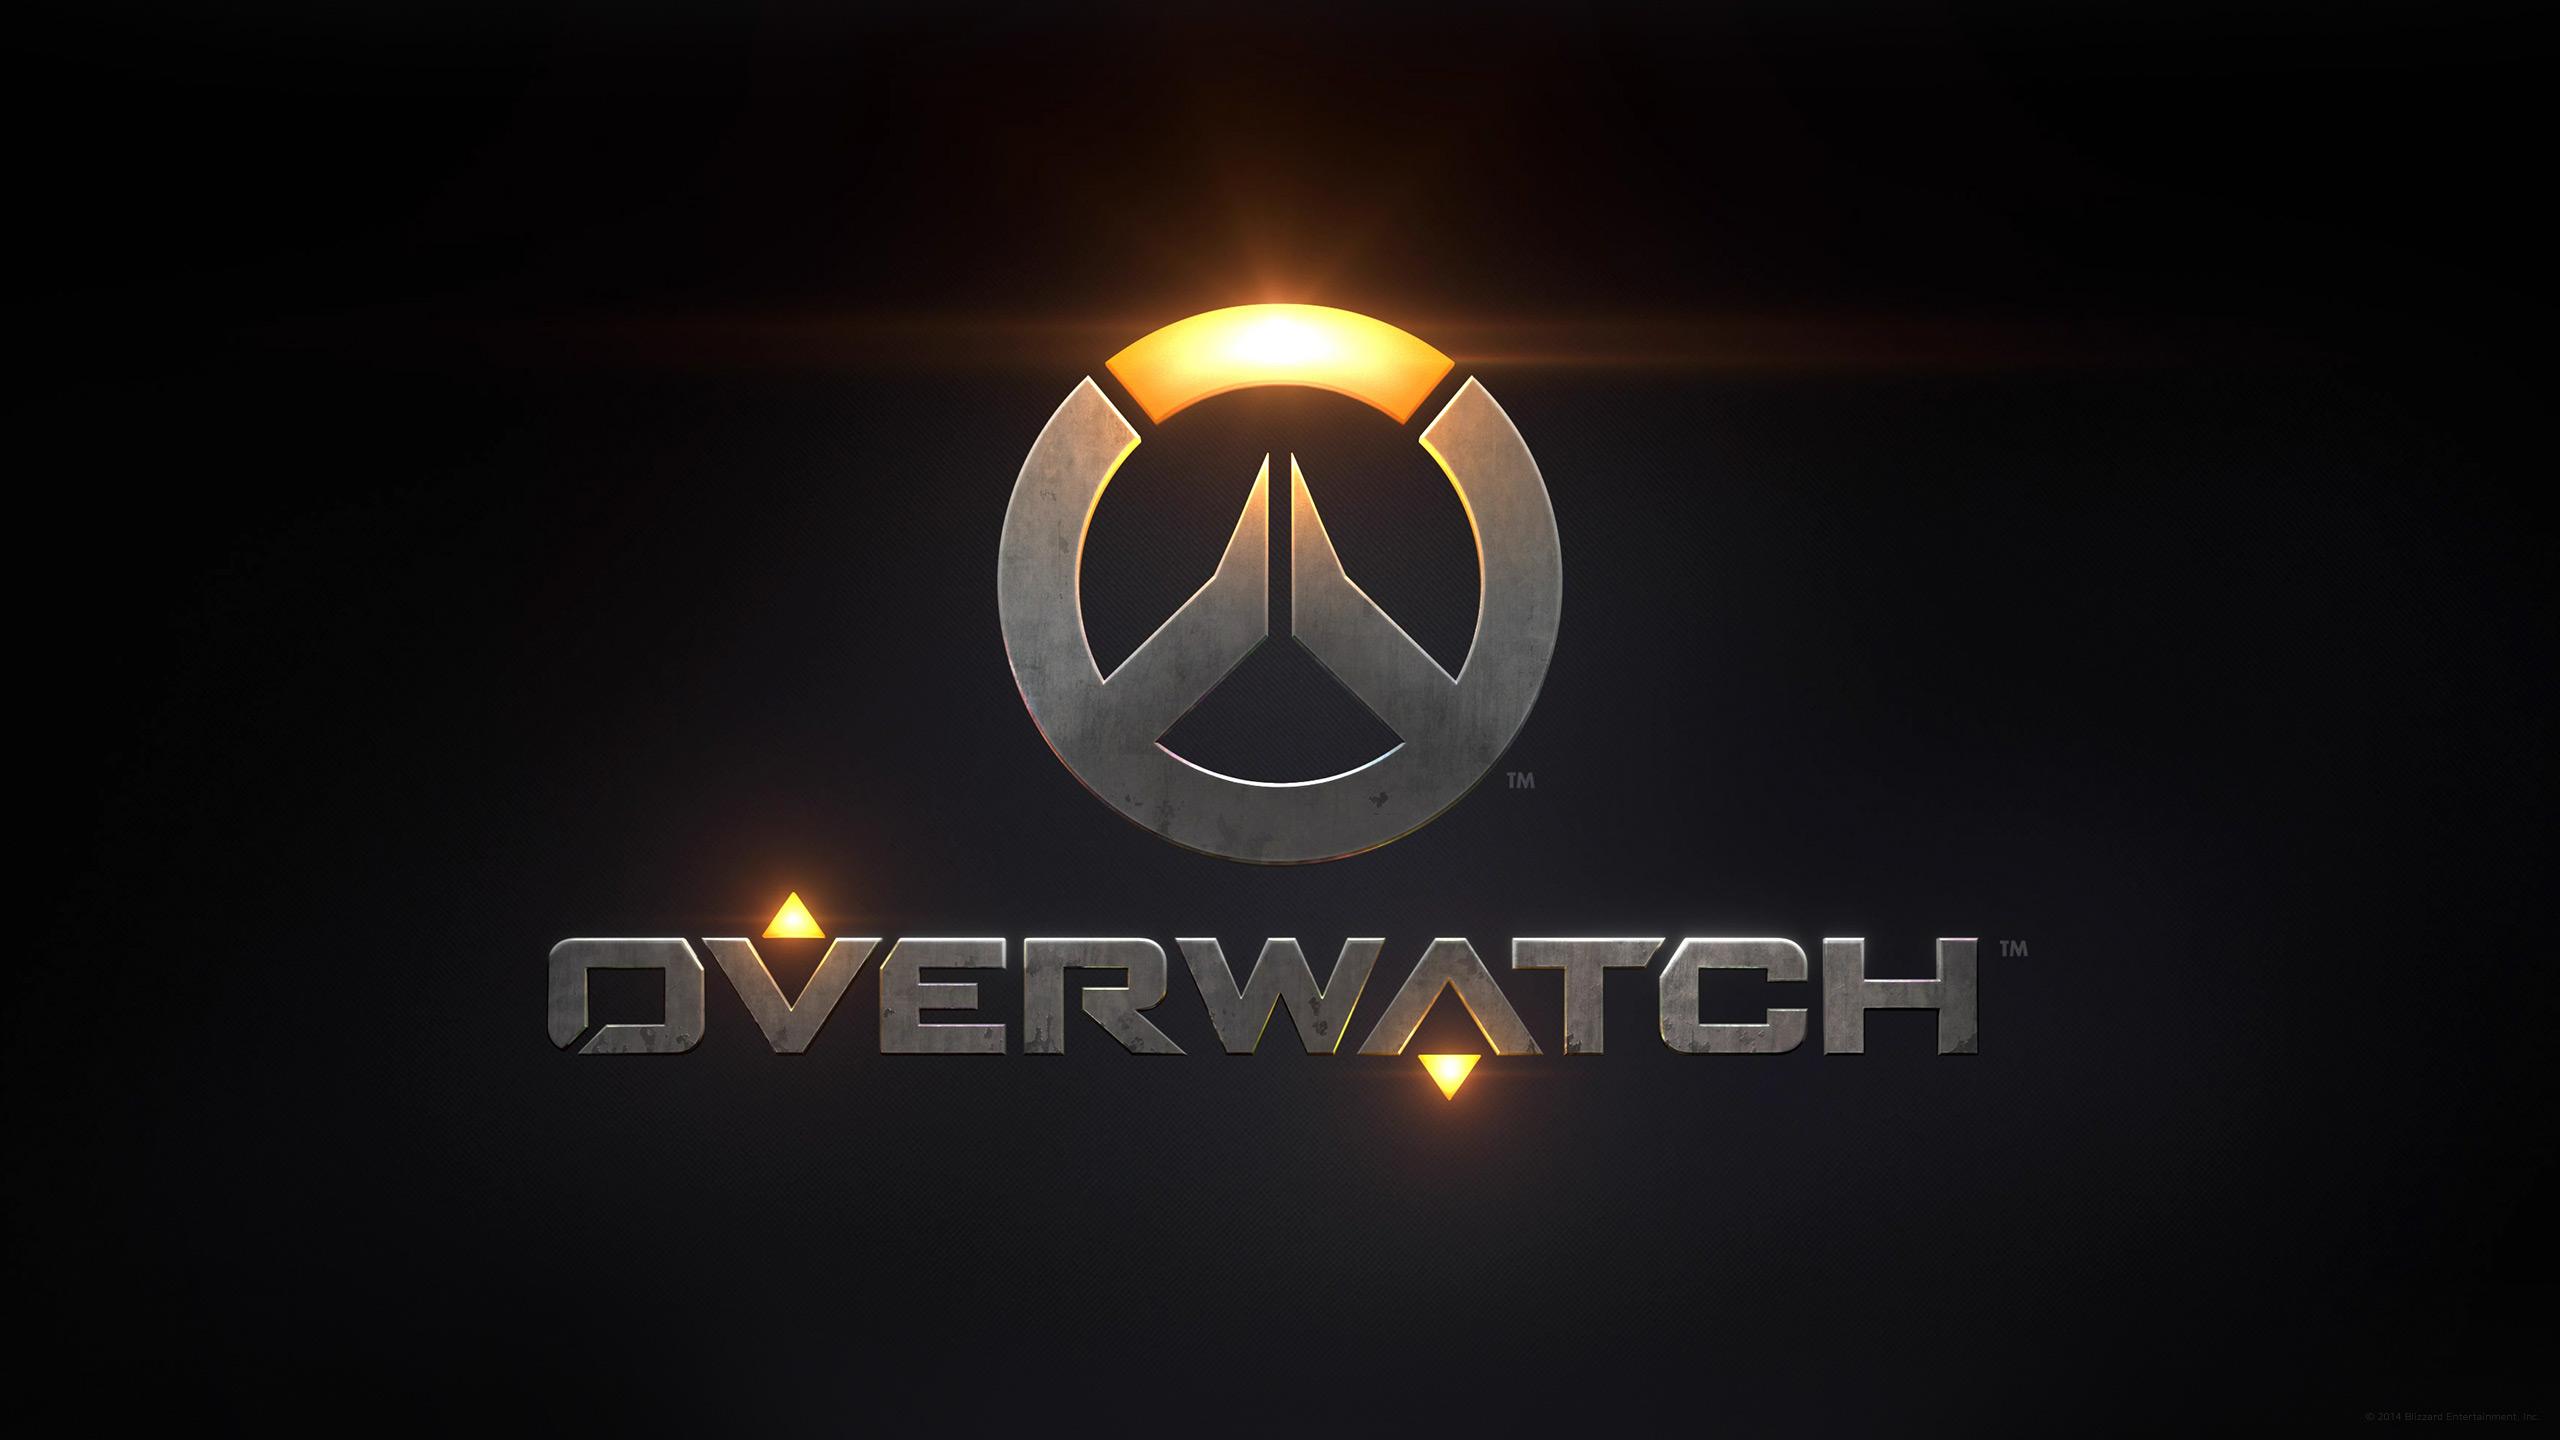 48+] Overwatch Mobile Wallpaper on WallpaperSafari.